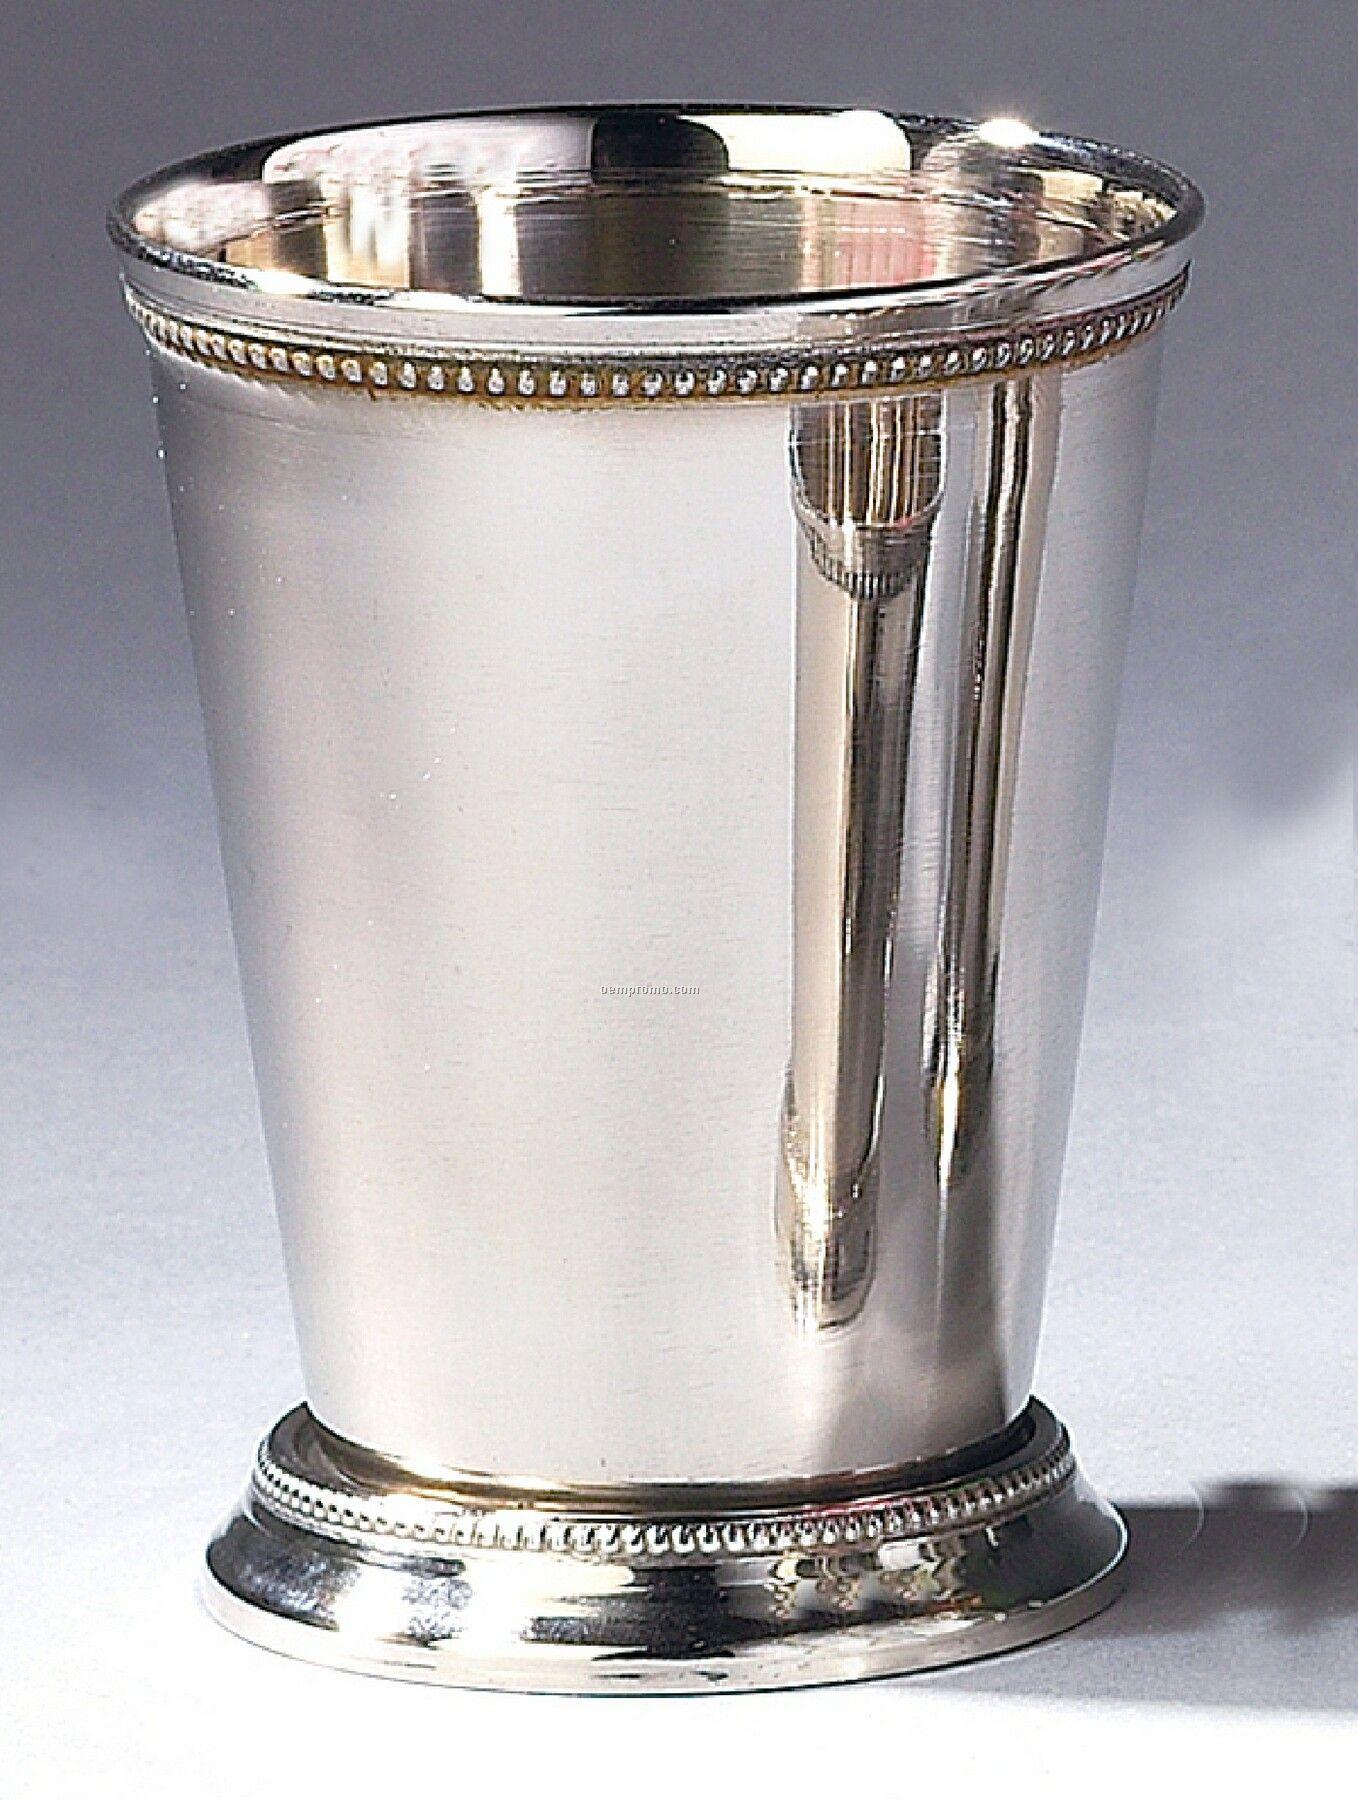 Beaded Mint Julep Cup W/ Bright Nickel Finish